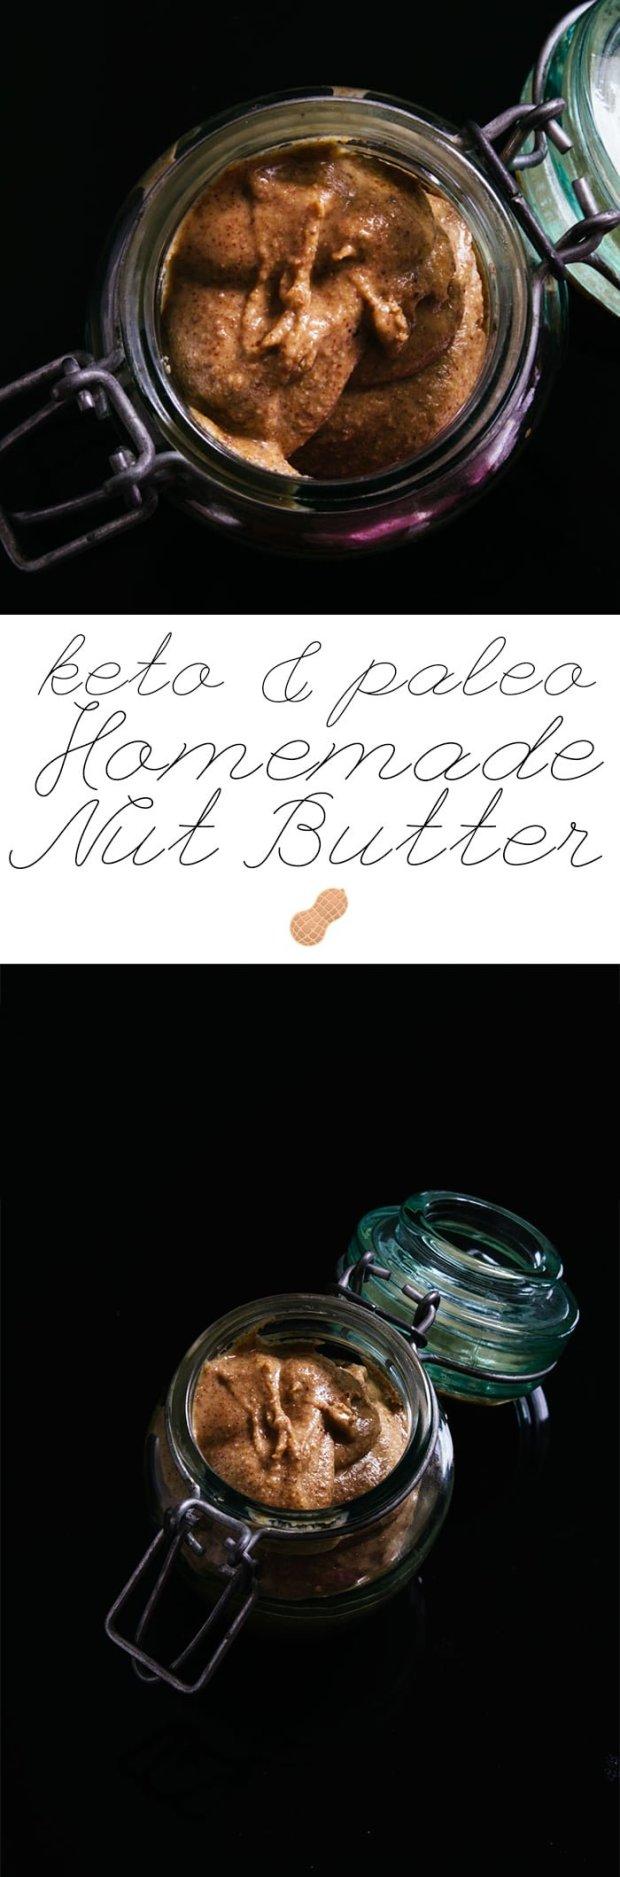 Paleo & Keto Homemade Nut Butter 🥜 #ketopeanutbutter #ketoalmondbutter